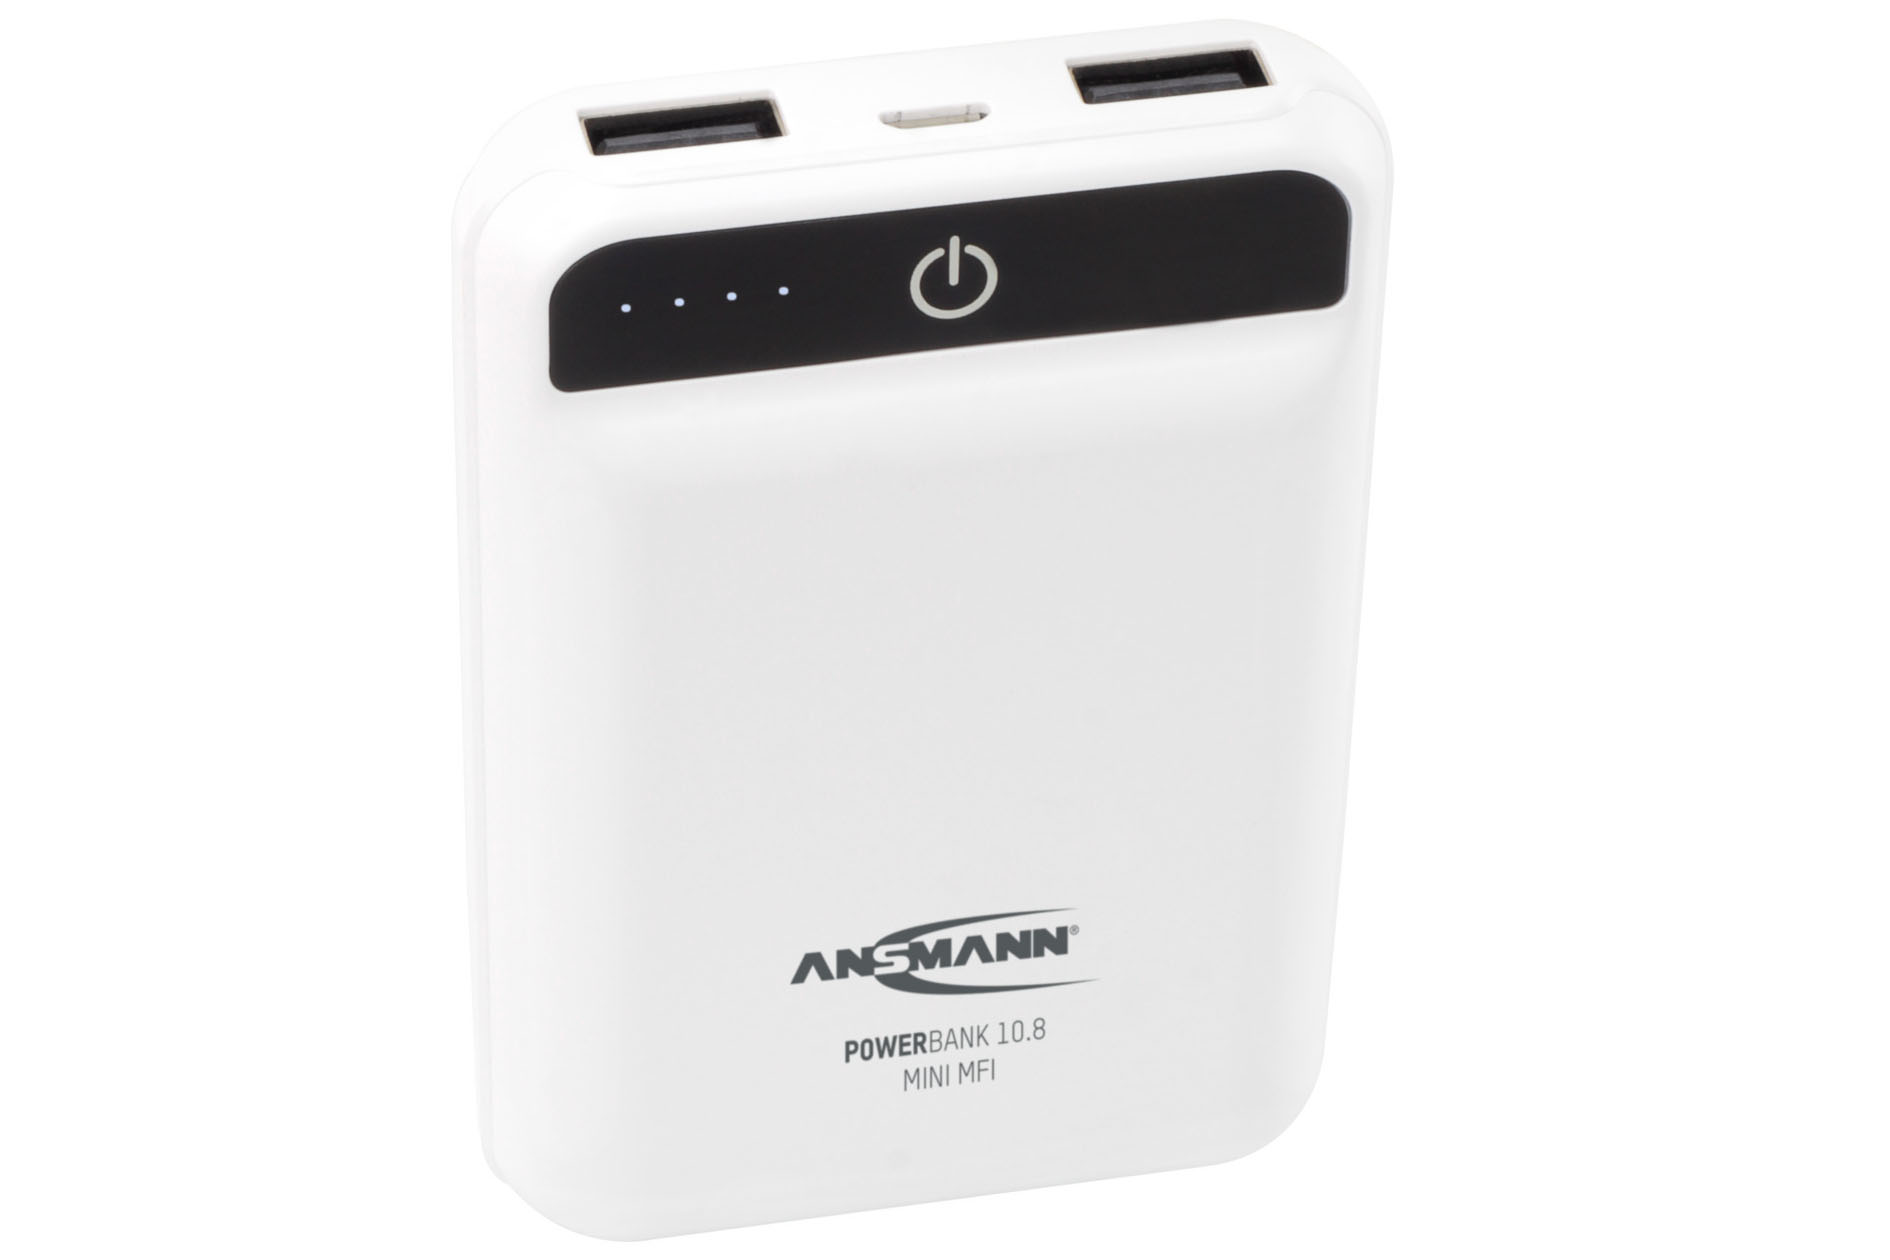 Ansmann 10.8 Mini MFI 10000mAh Portable Power Bank with Dual Charging Ports - White